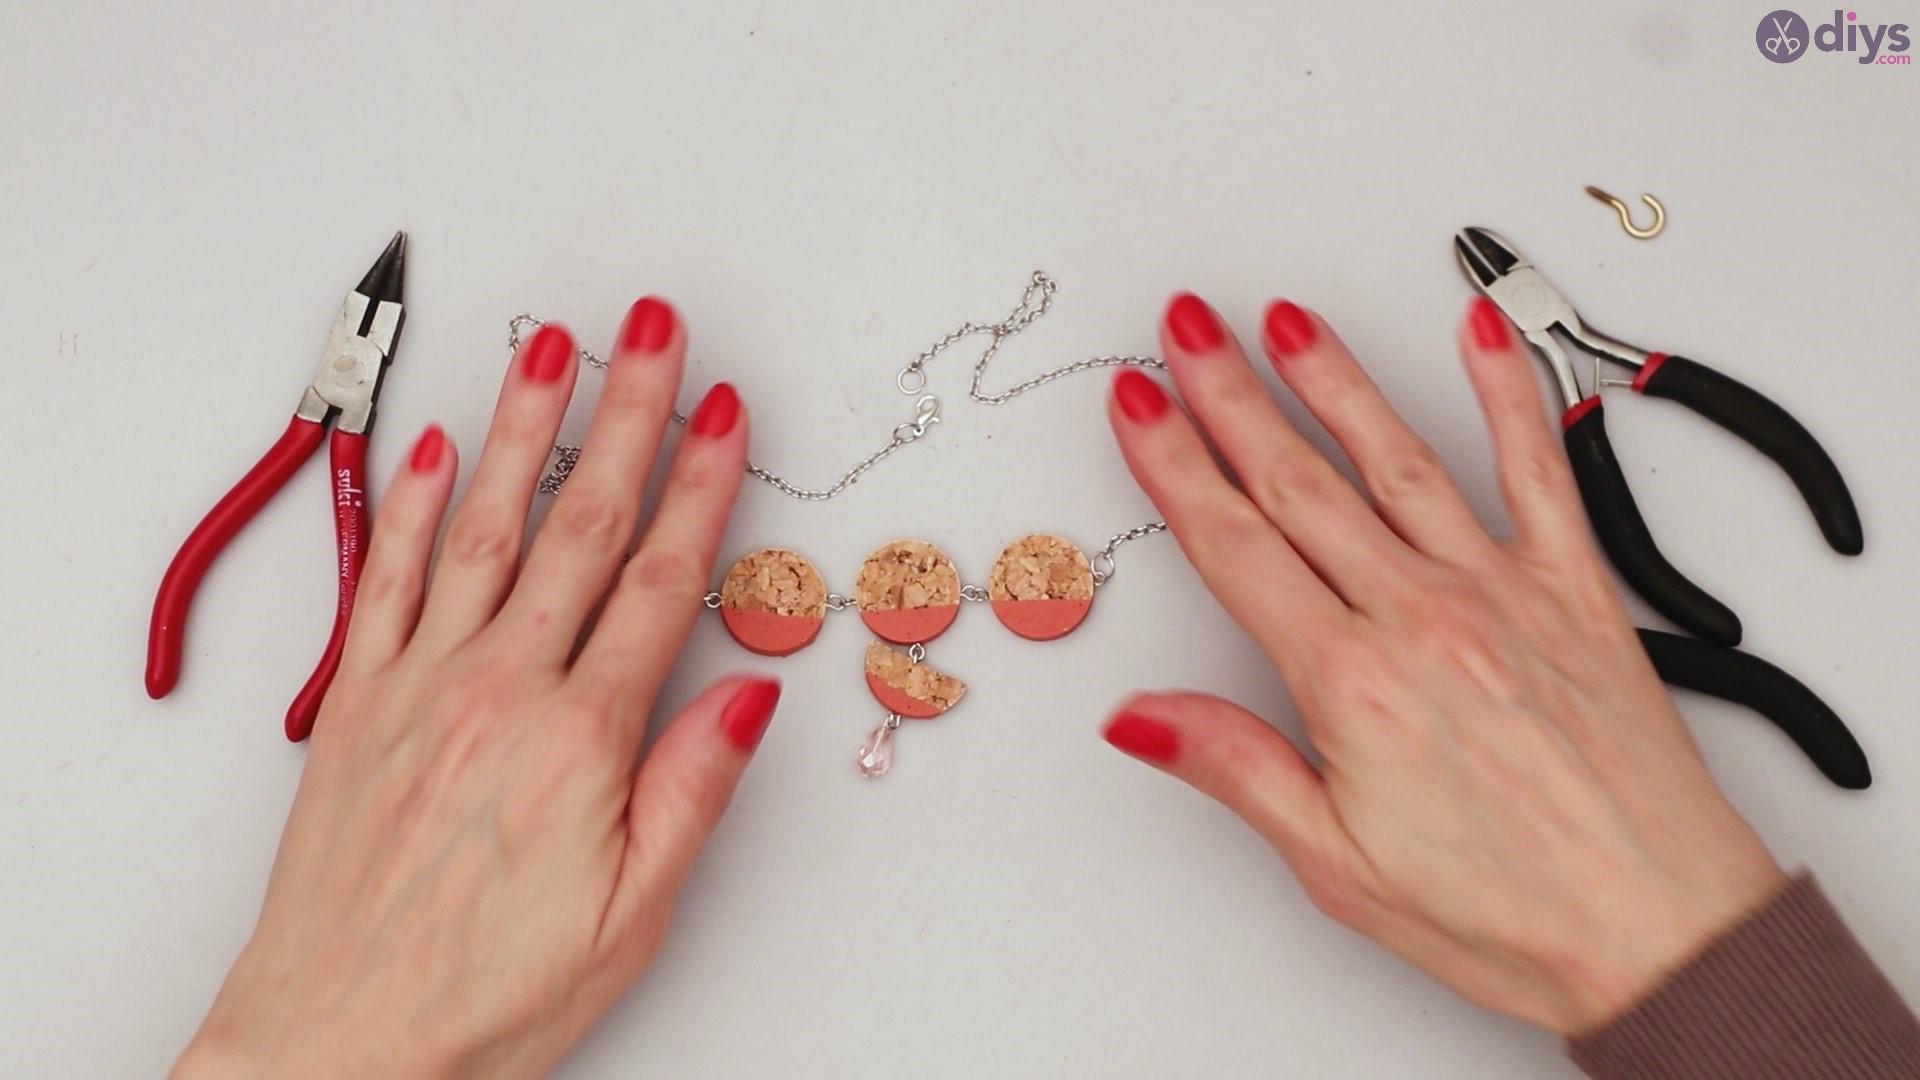 Diy wine cork necklace (54)